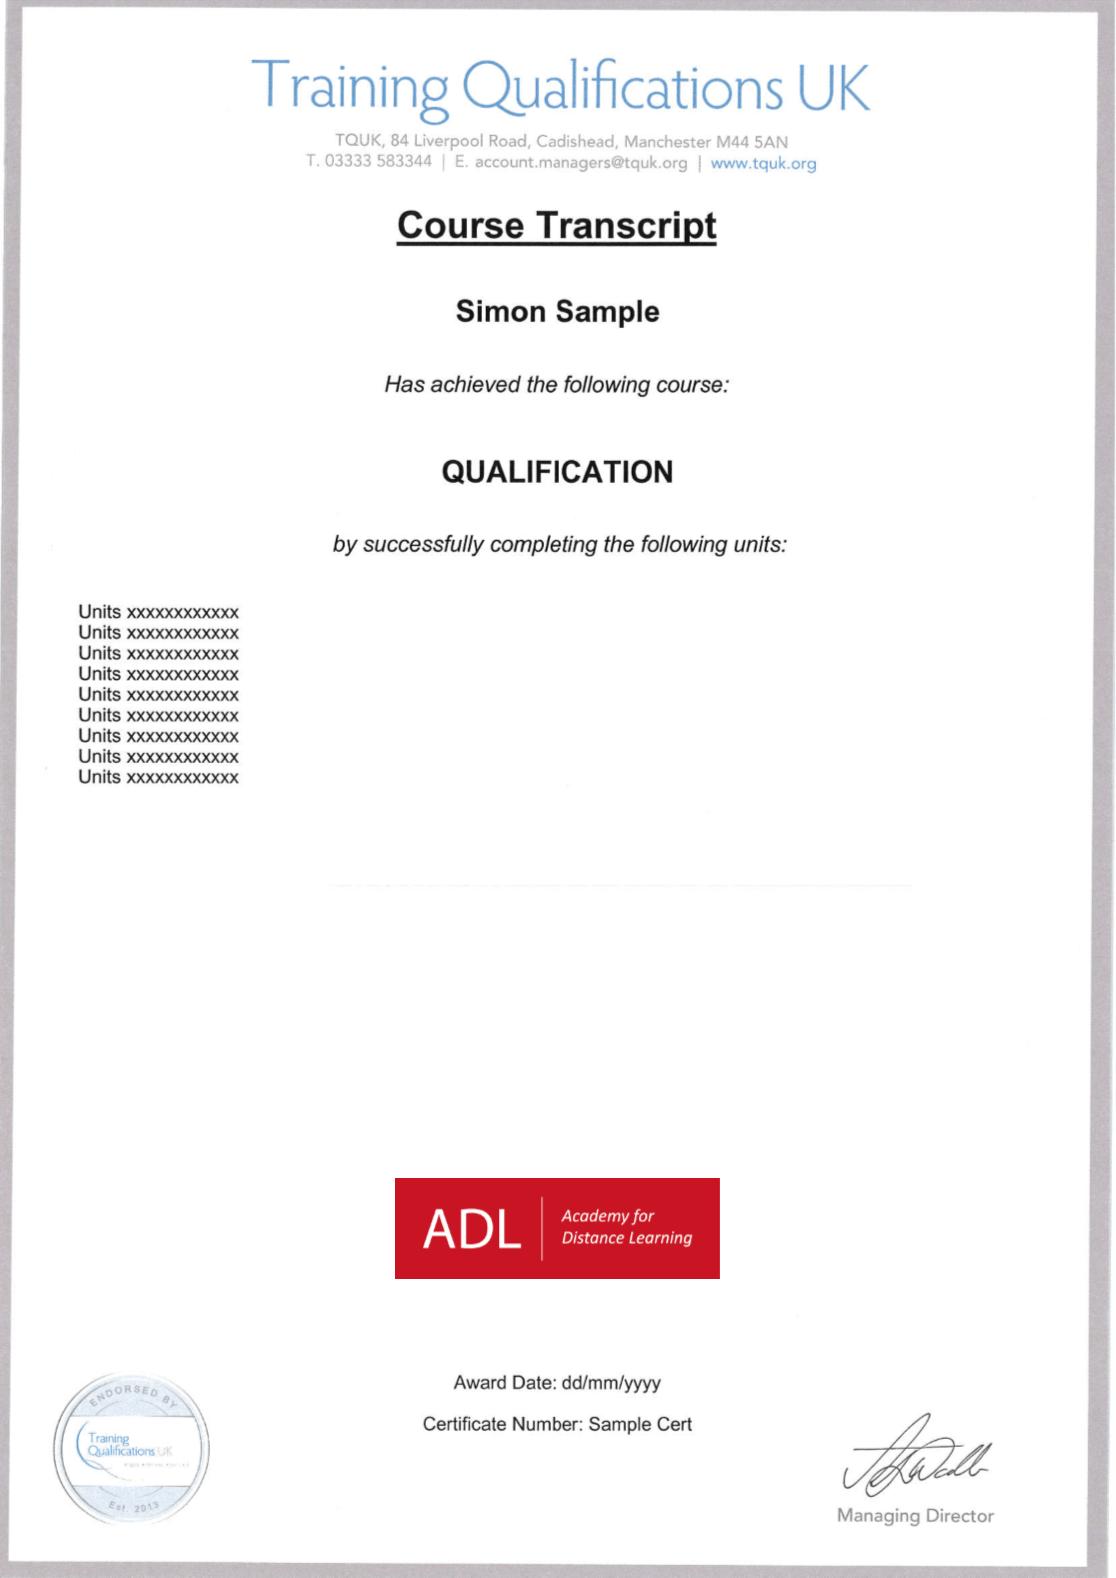 Sample course transcript